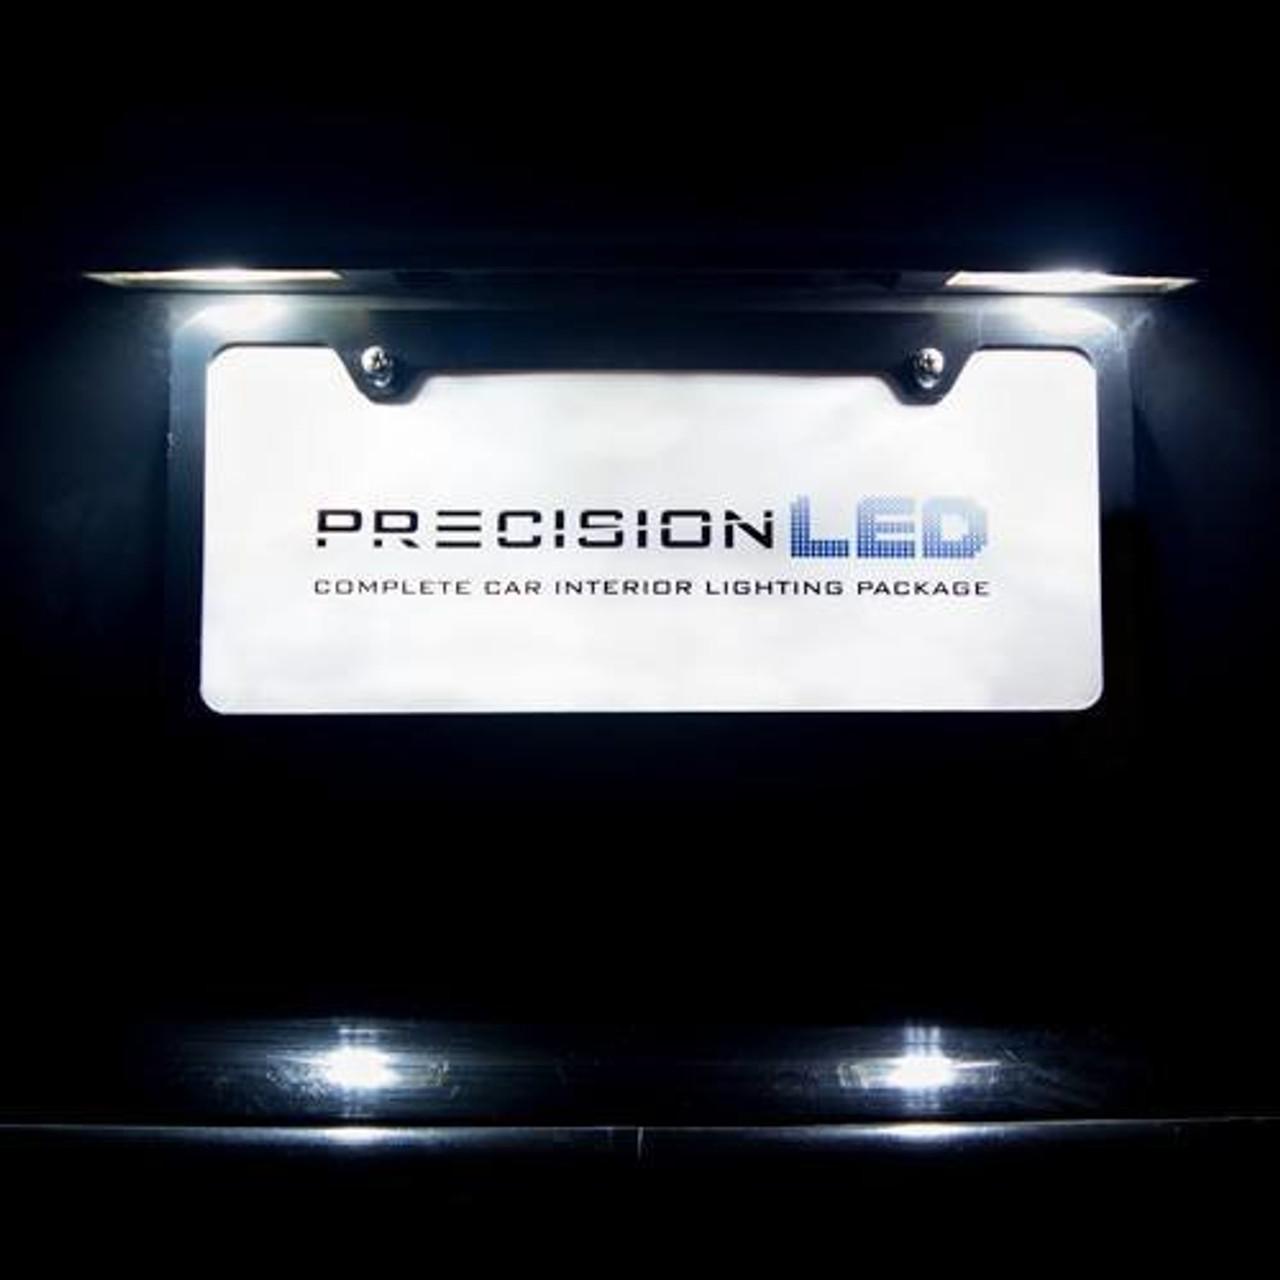 BMW Z8 E52 LED License Plate Lights (1999-2003)